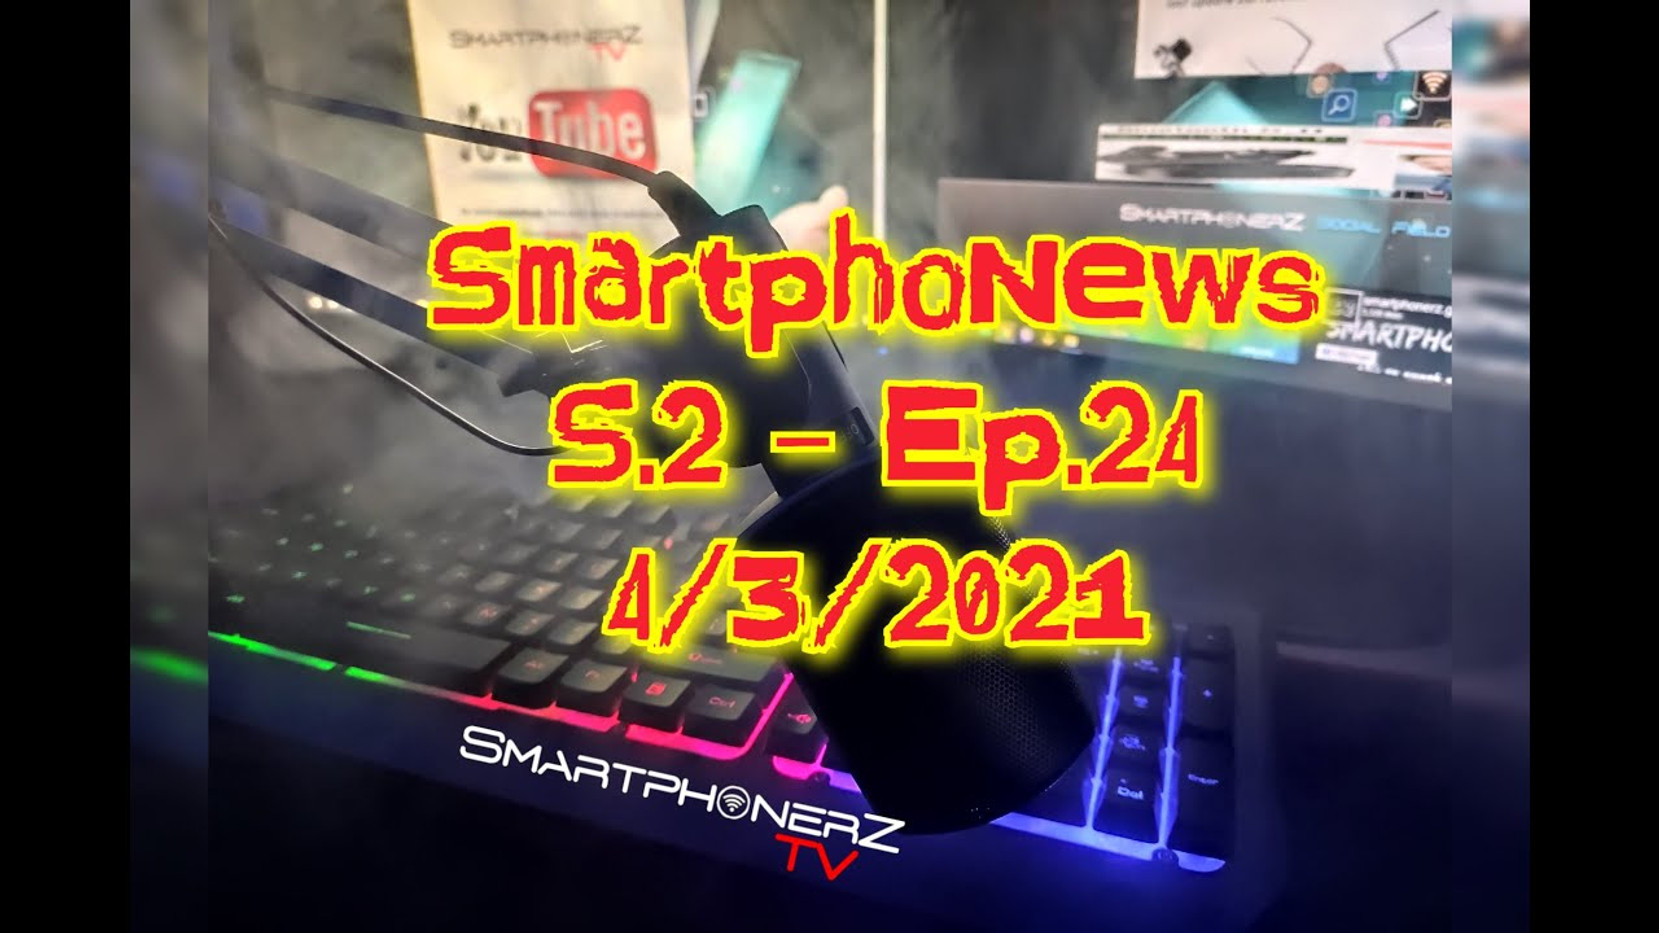 SmartphoNews S.2 - Ep.24